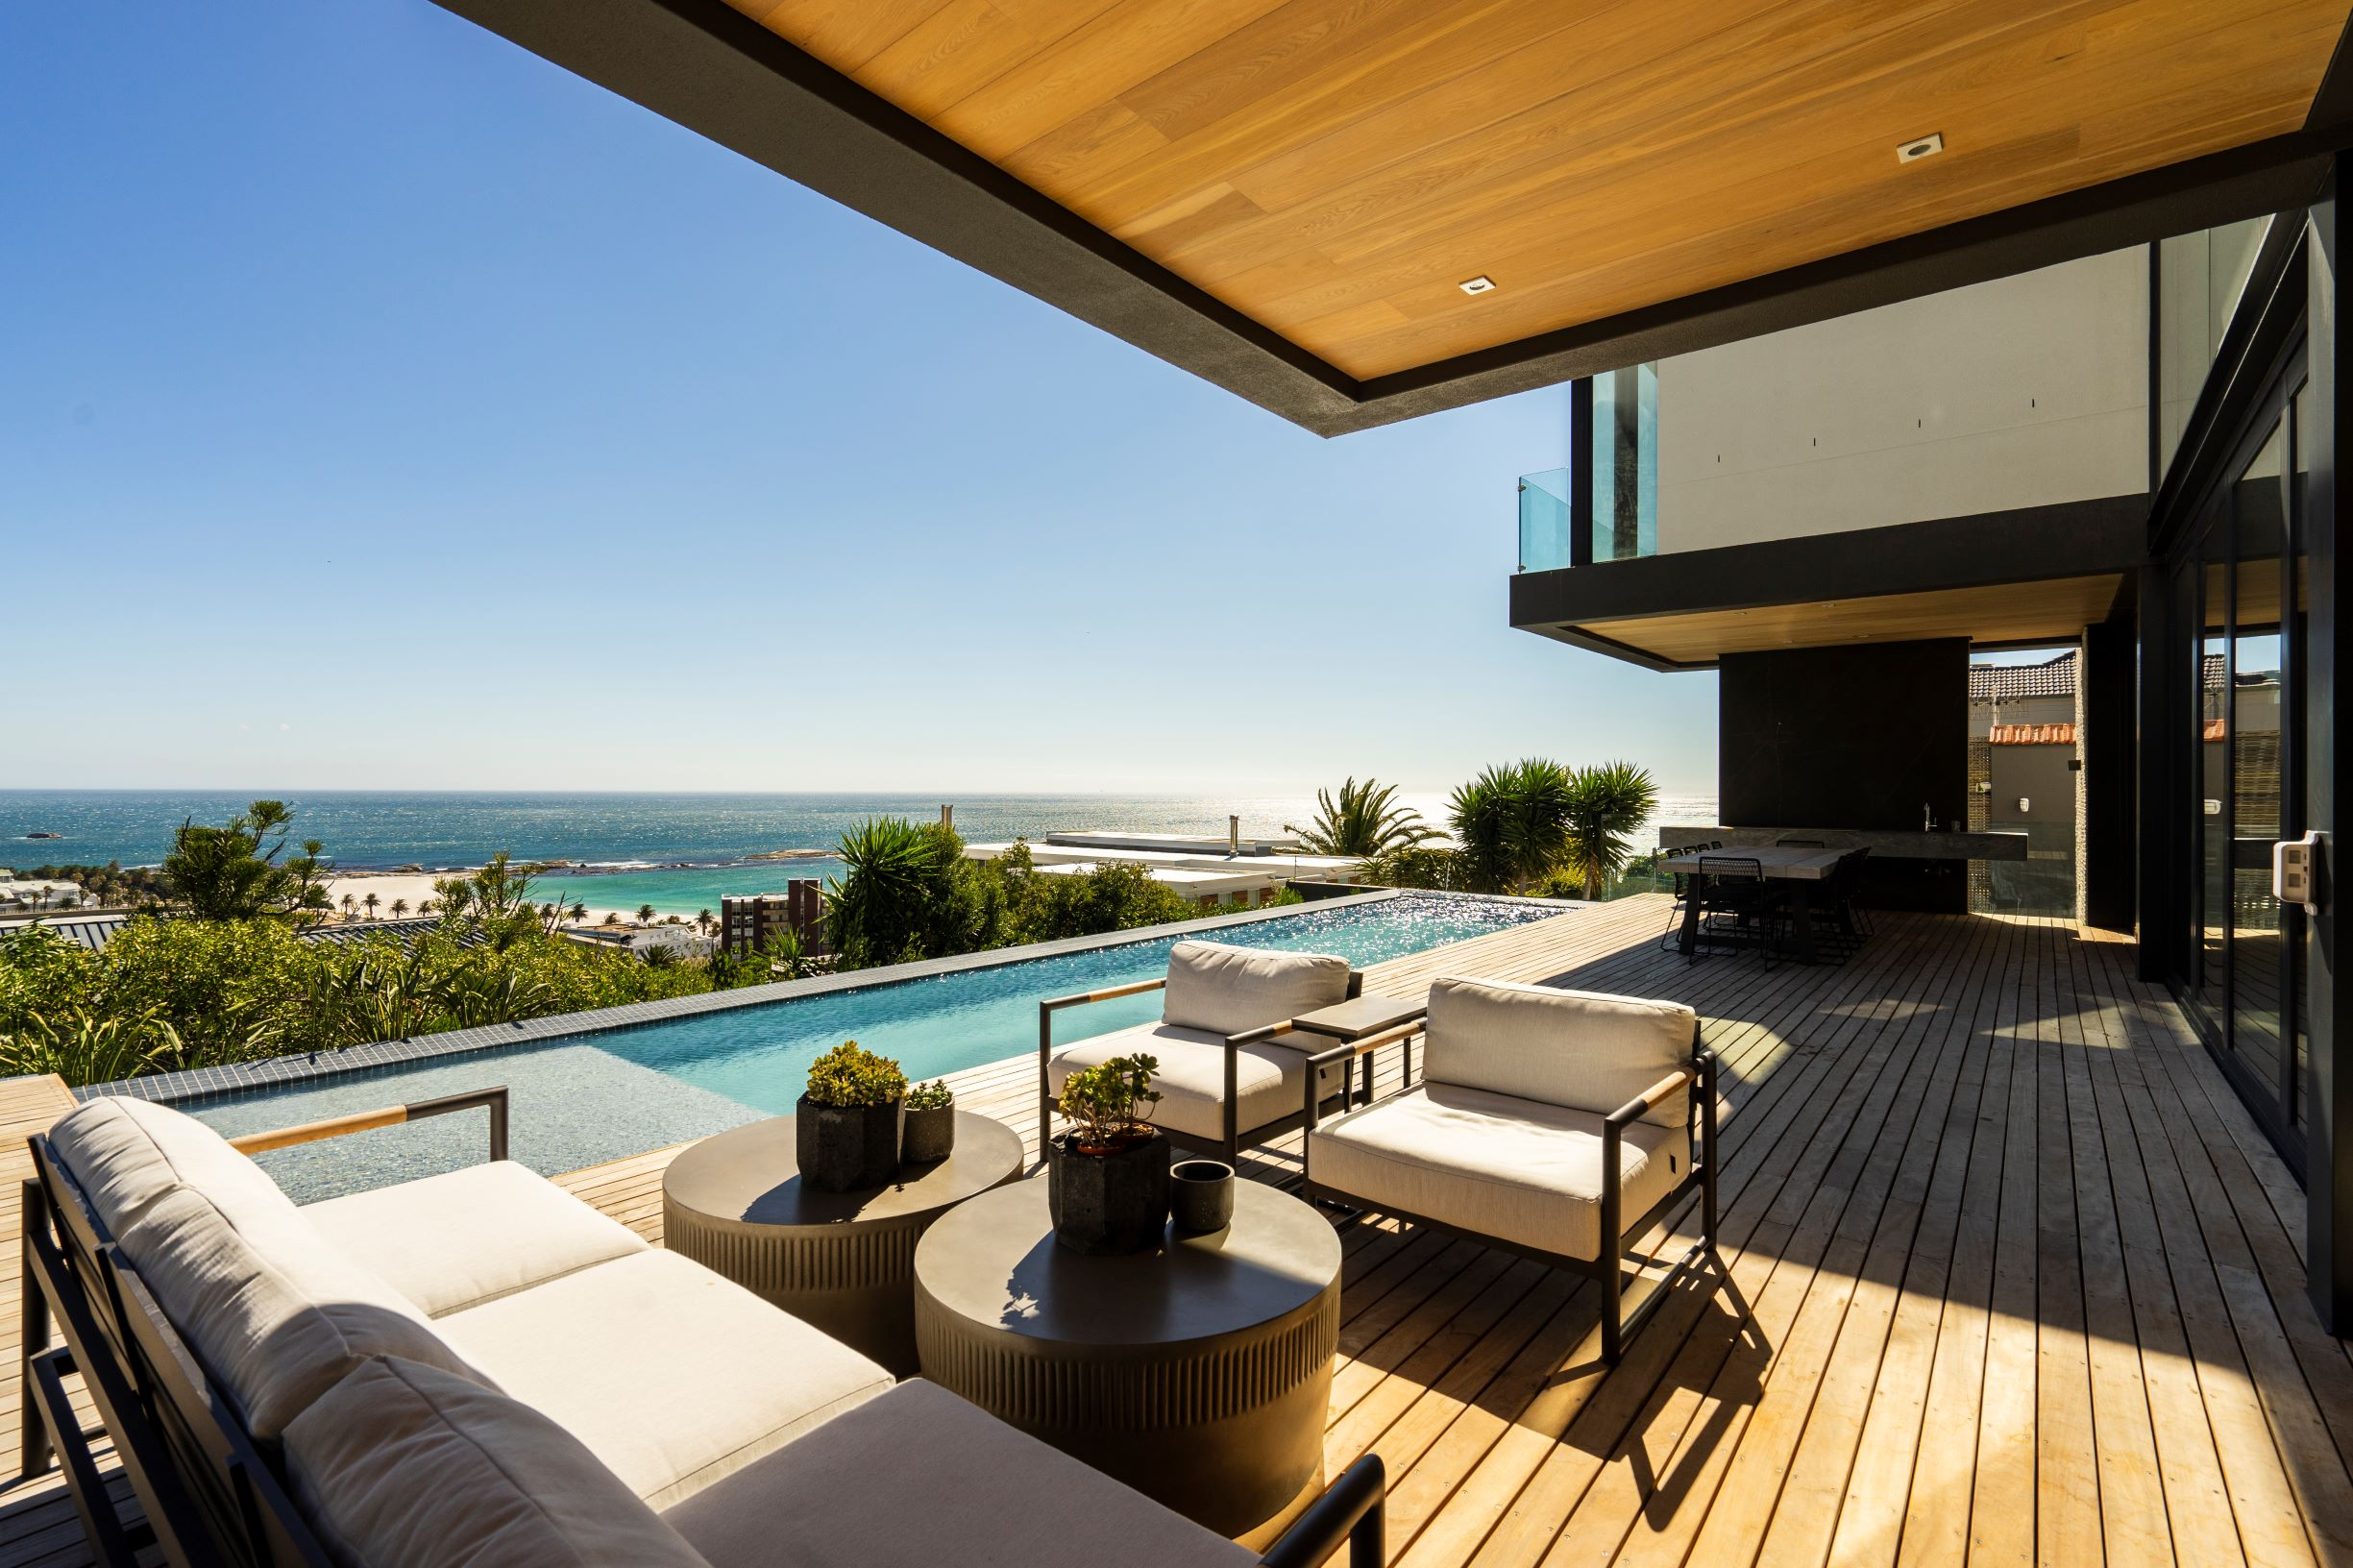 Stefan Antoni designed Villa Camps Bay